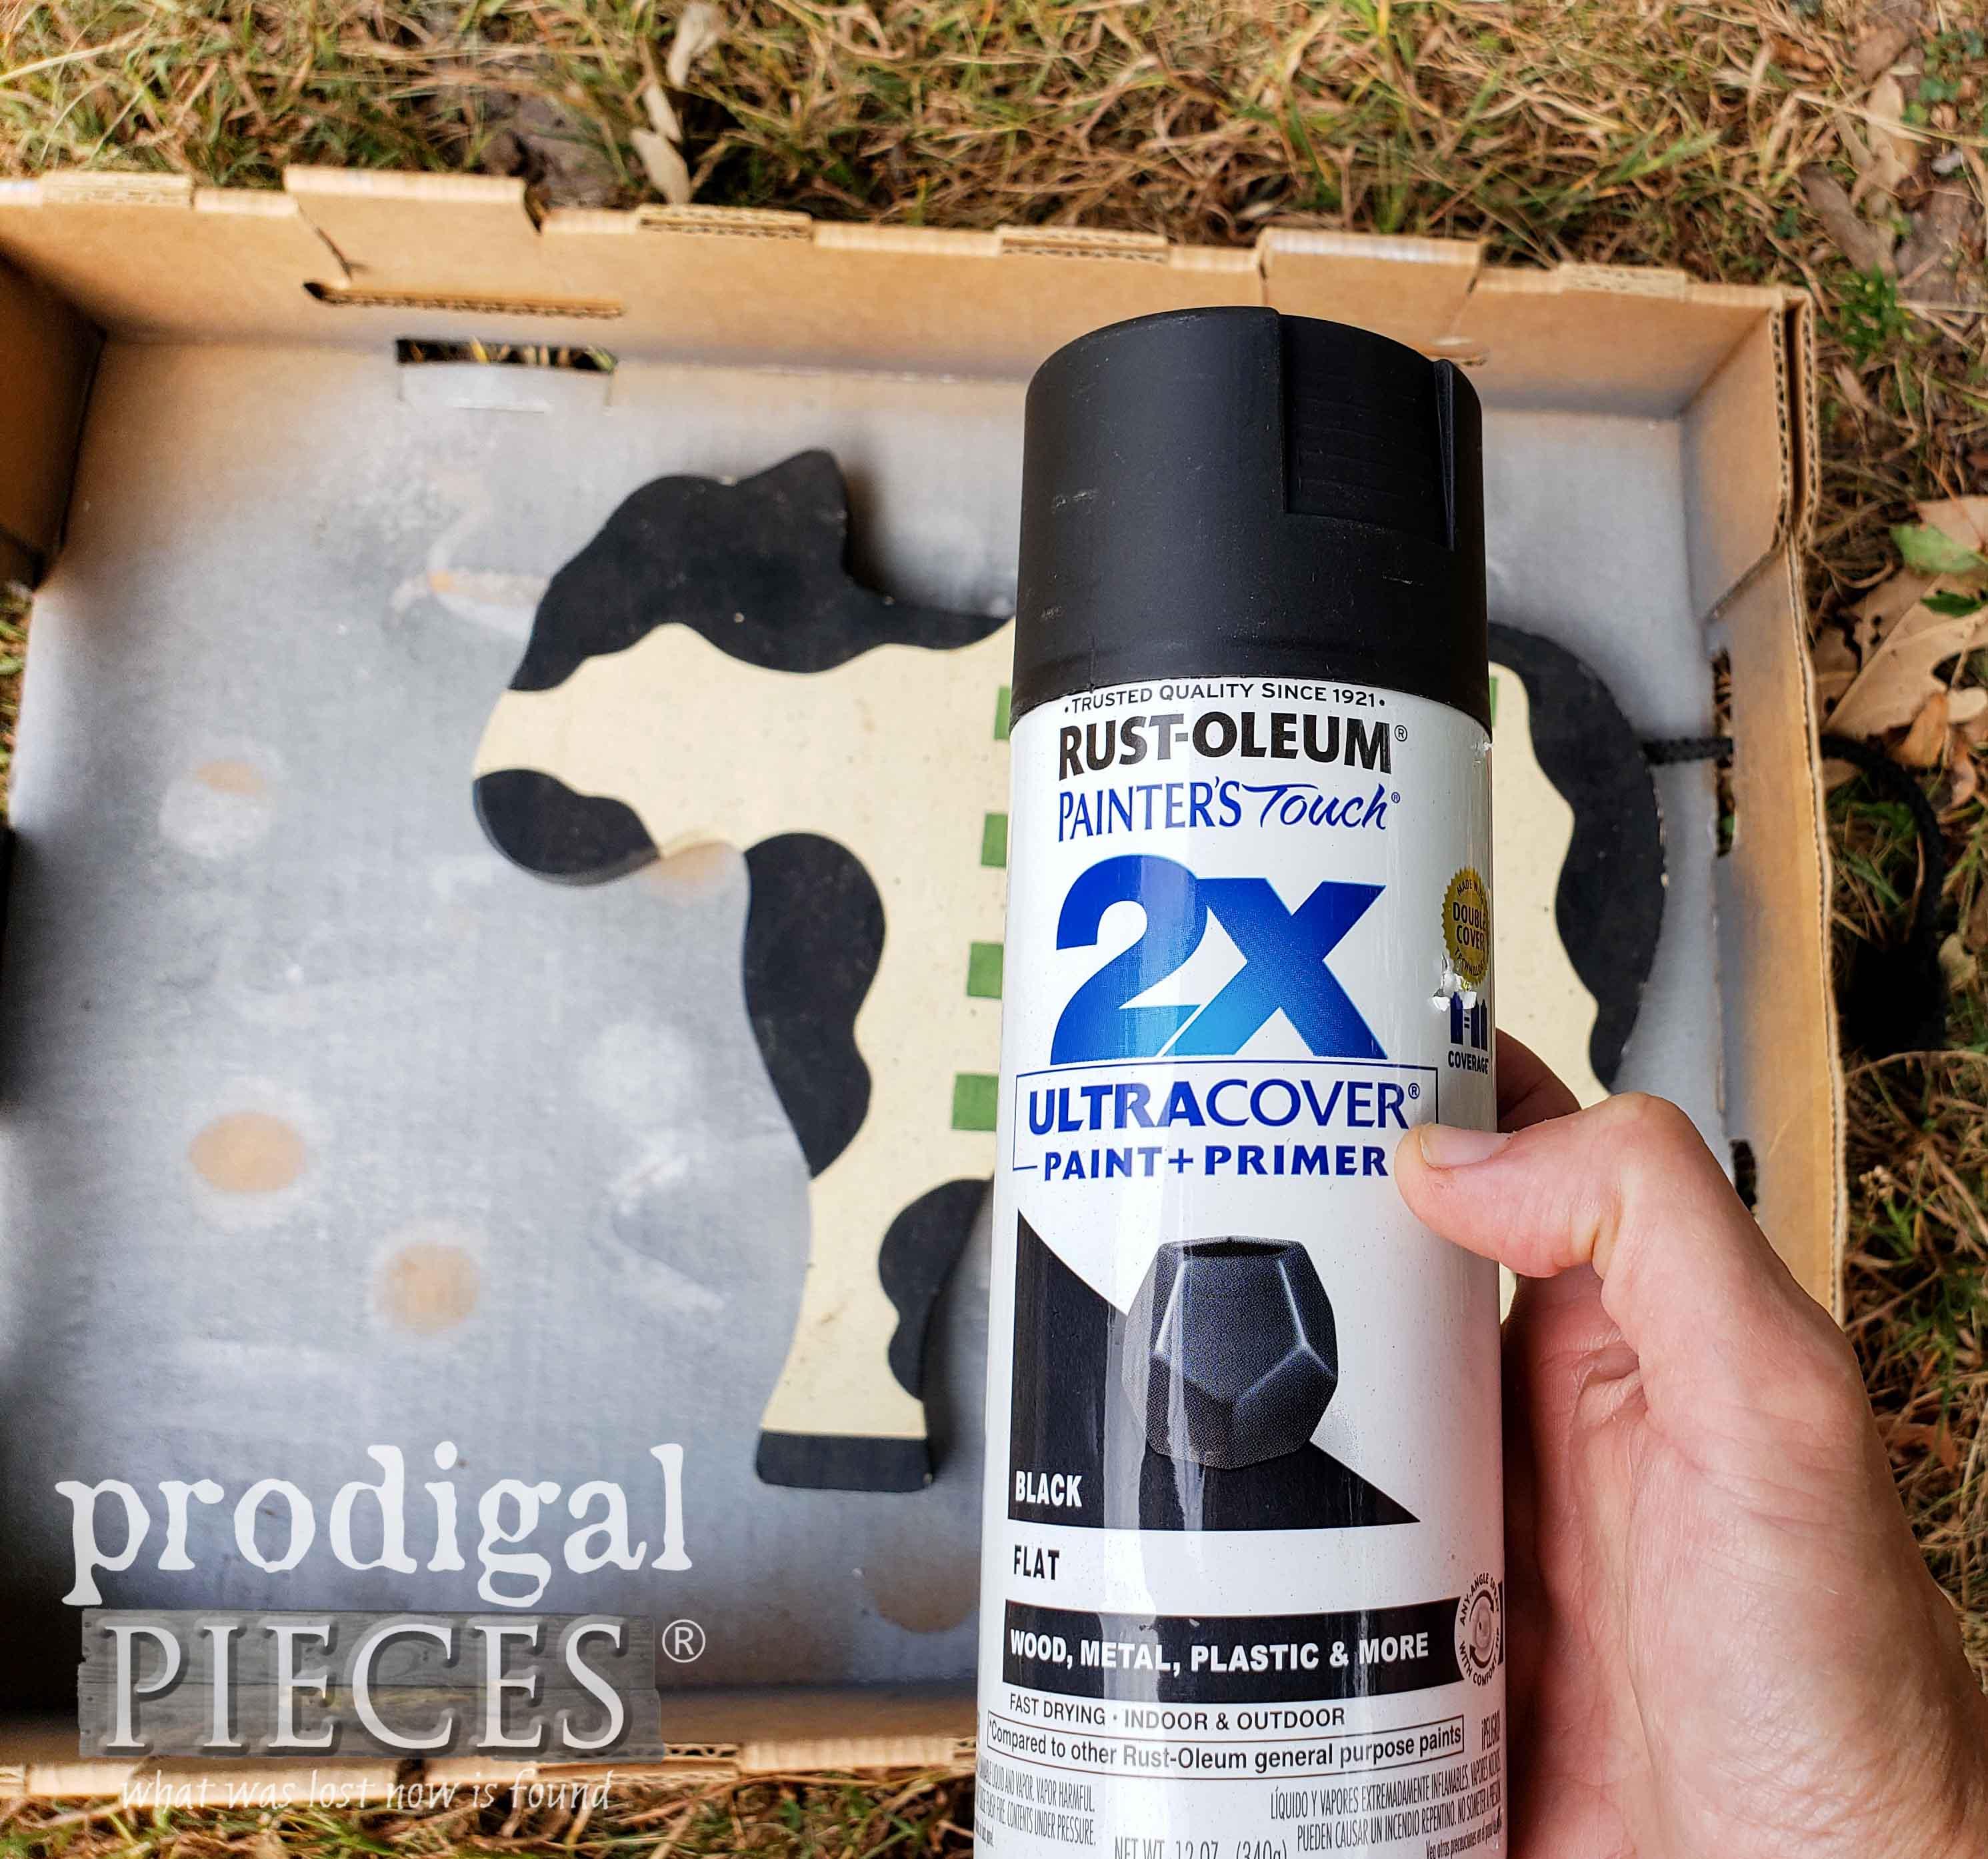 Rustoleum Flat Black Spray Paint for DIY Farmhouse Sign | prodigalpieces.com